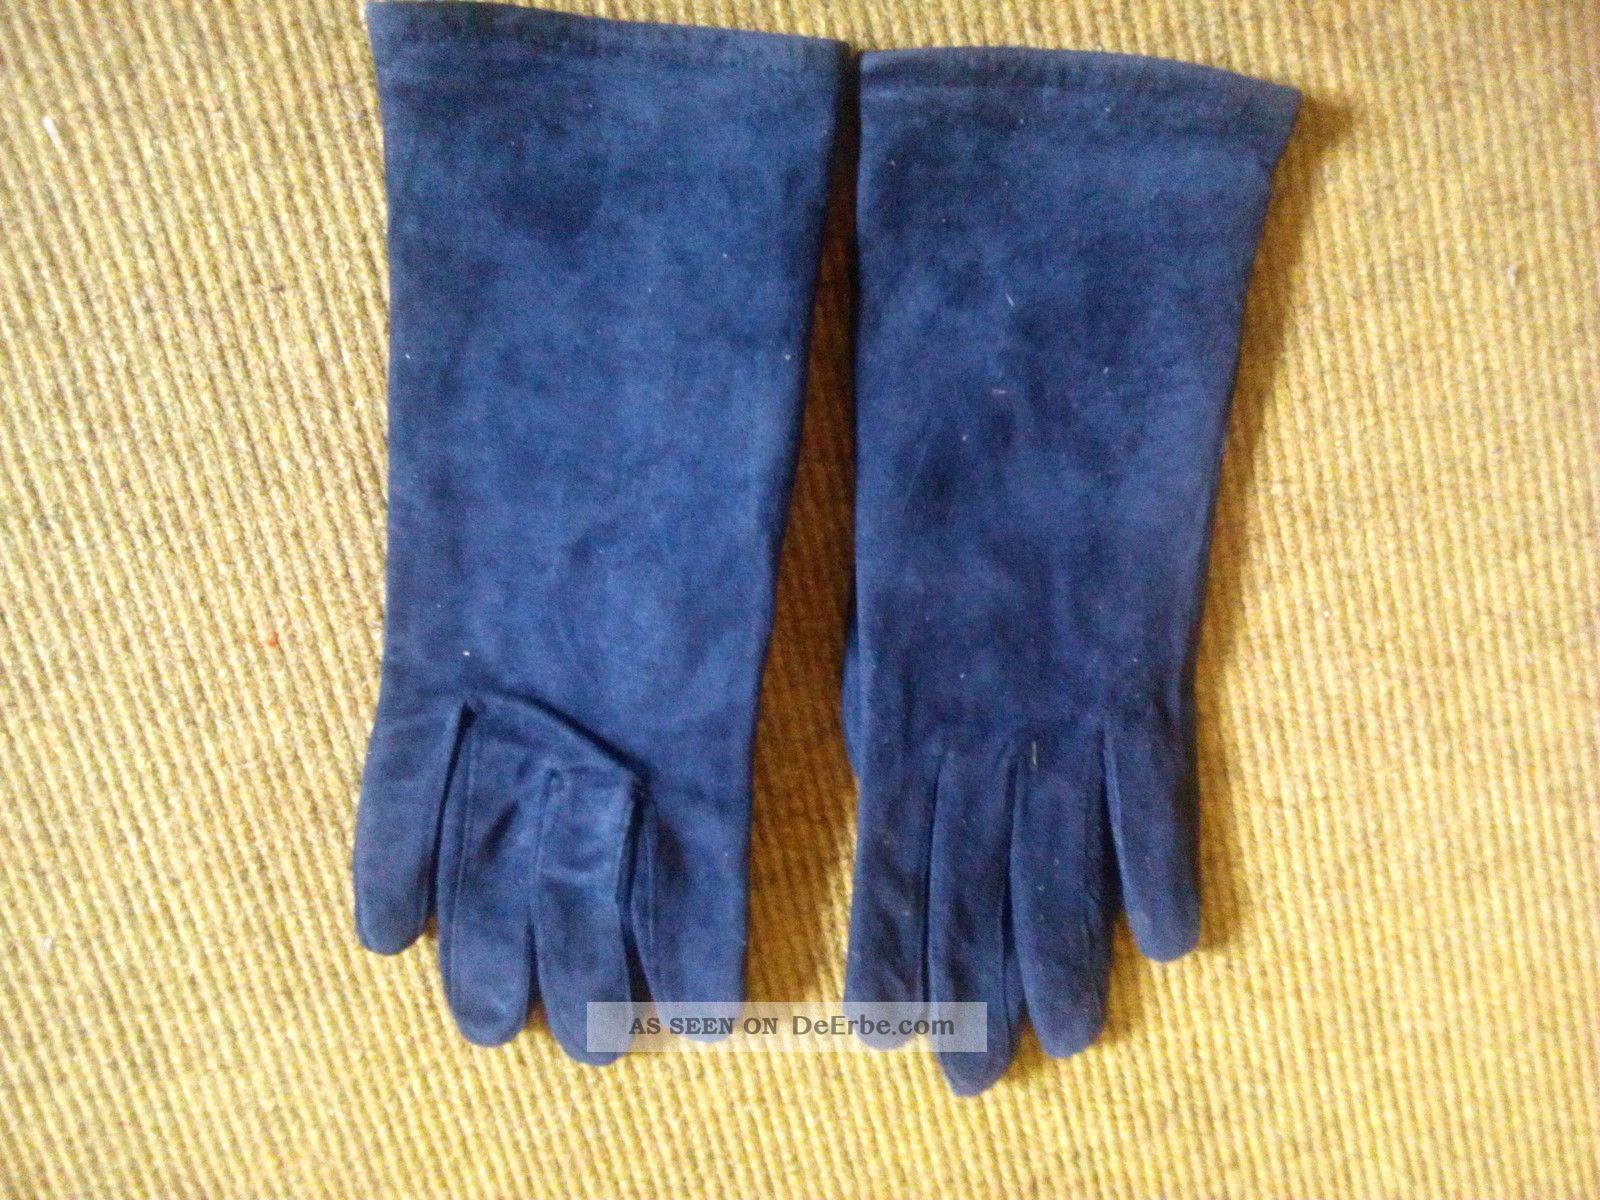 Wildlederhandschuhe Echtleder Blau True Vintage Ca.  Gr.  7 Accessoires Bild